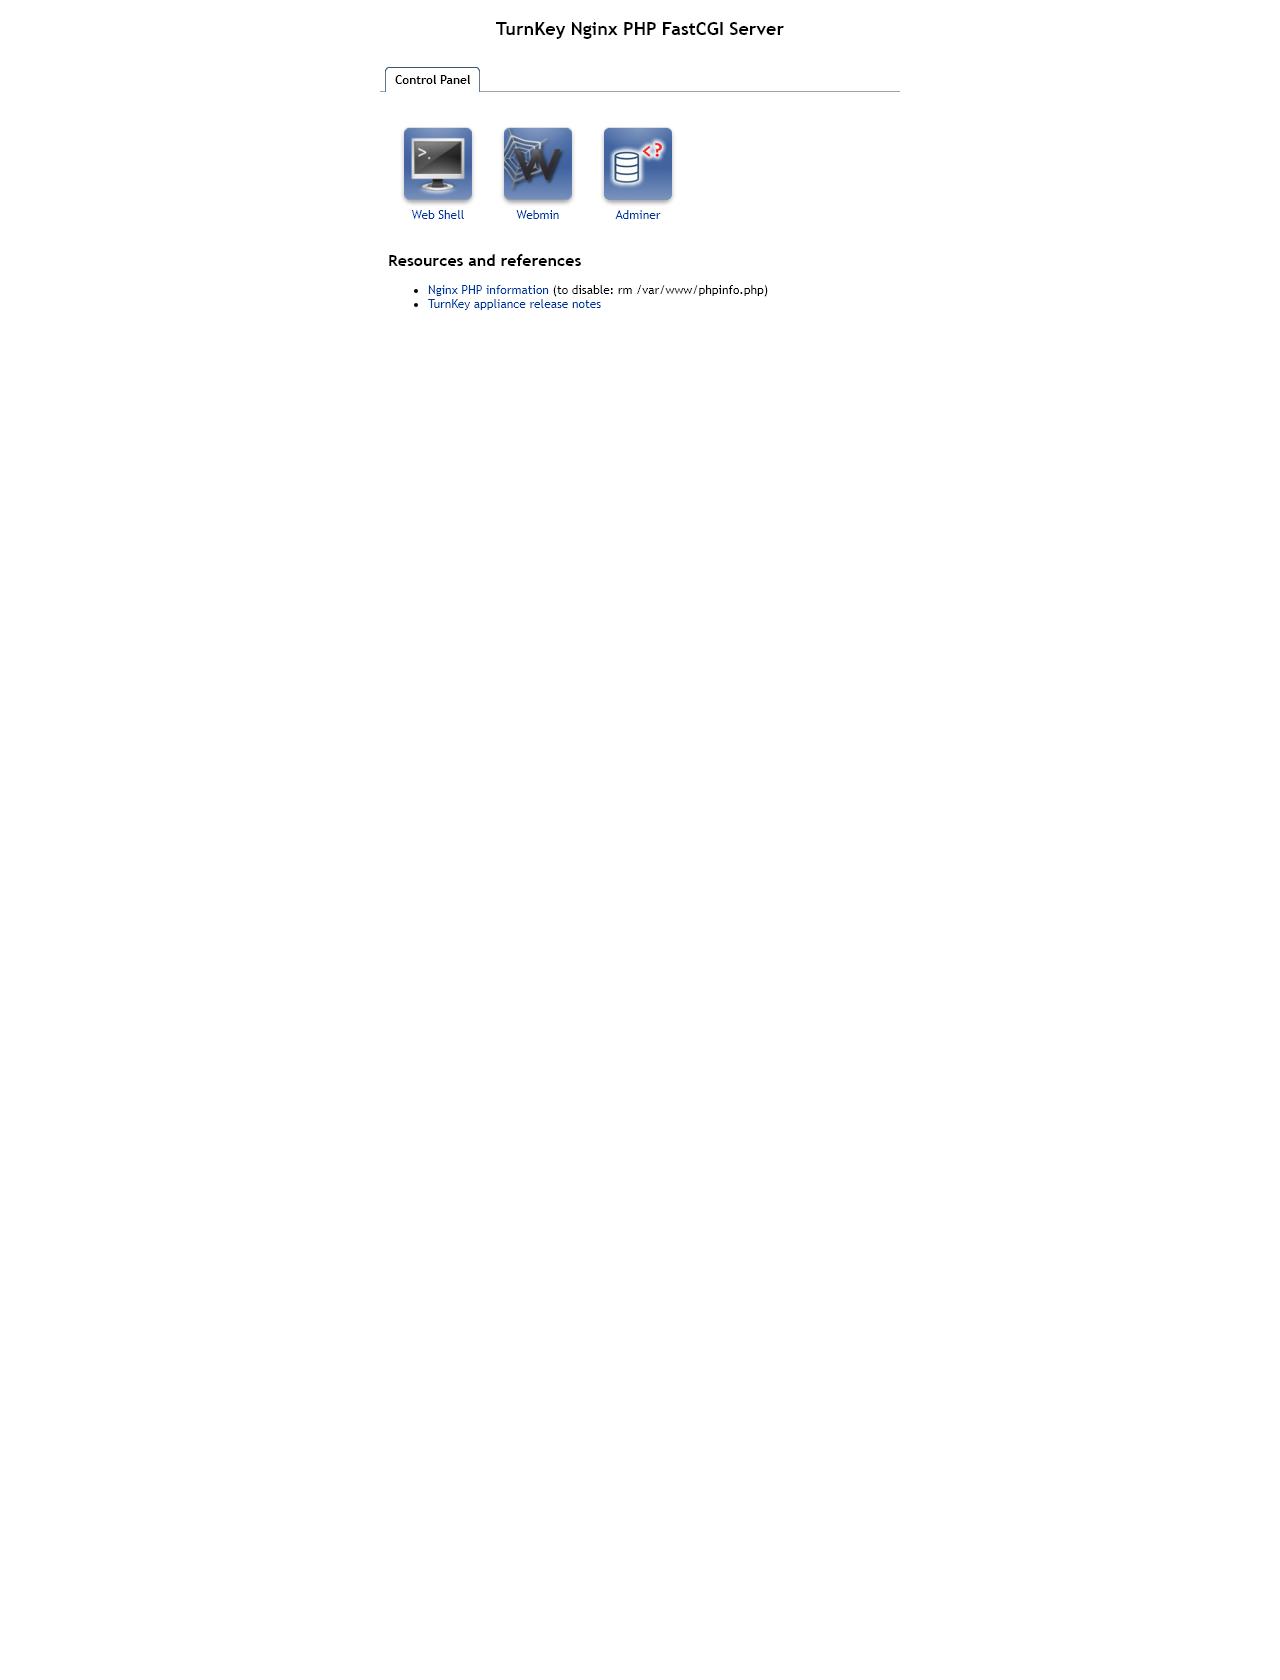 Screenshot Desktop - https://nmubbb.tk/